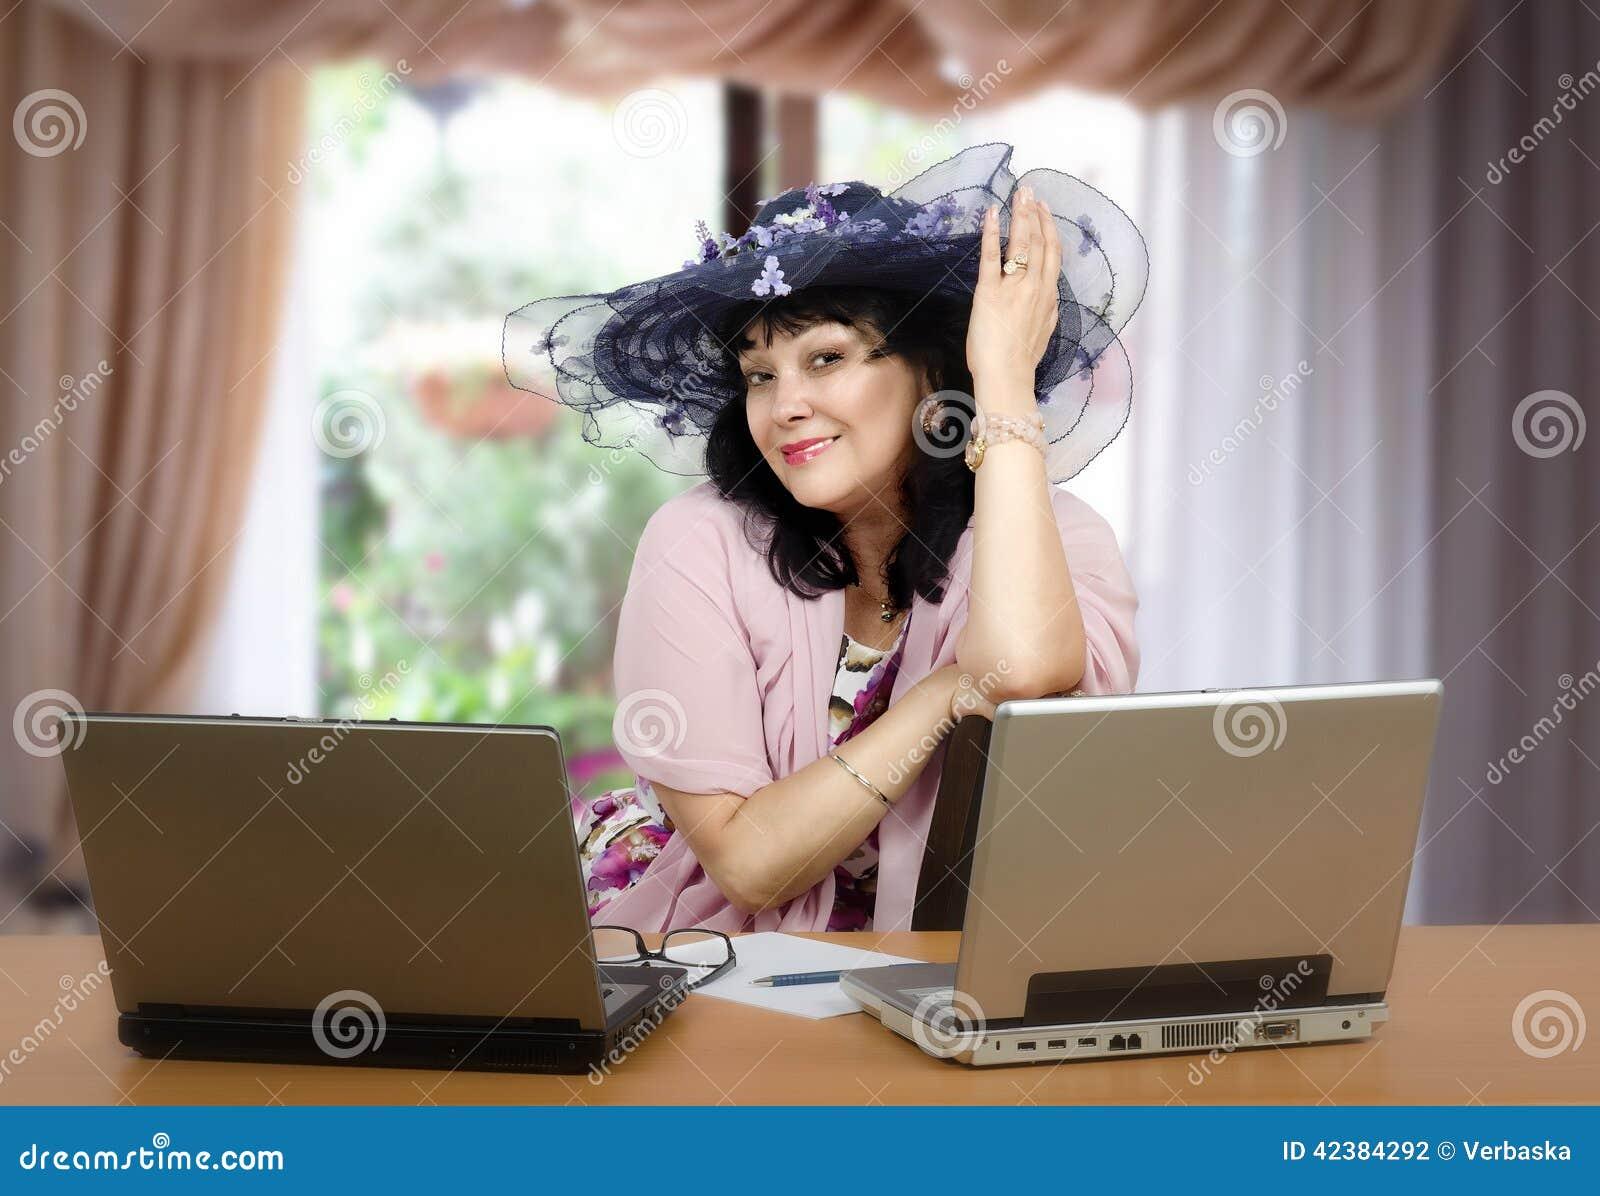 The matchmaker online